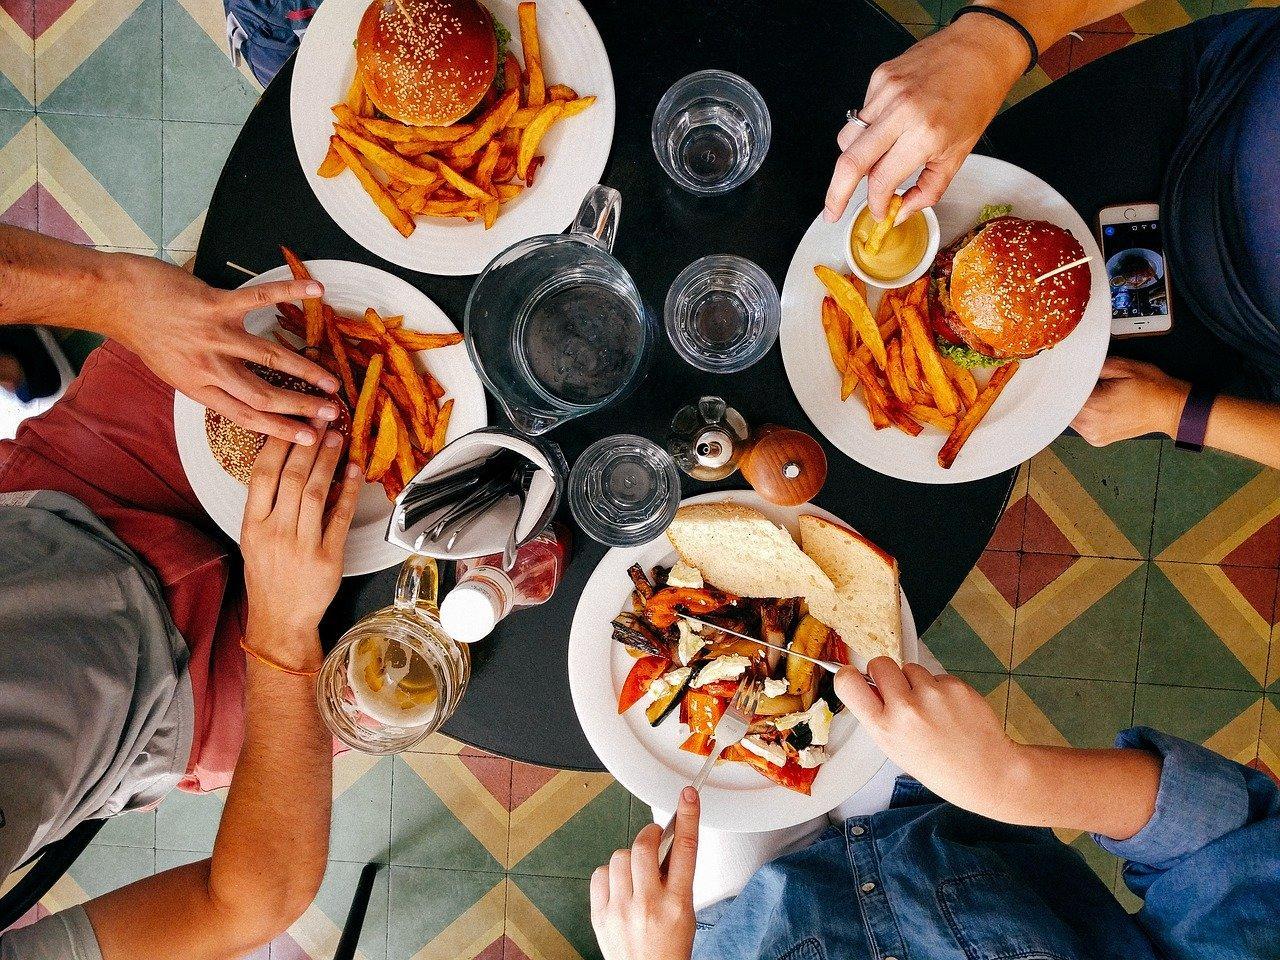 Restaurant 2602736 1280